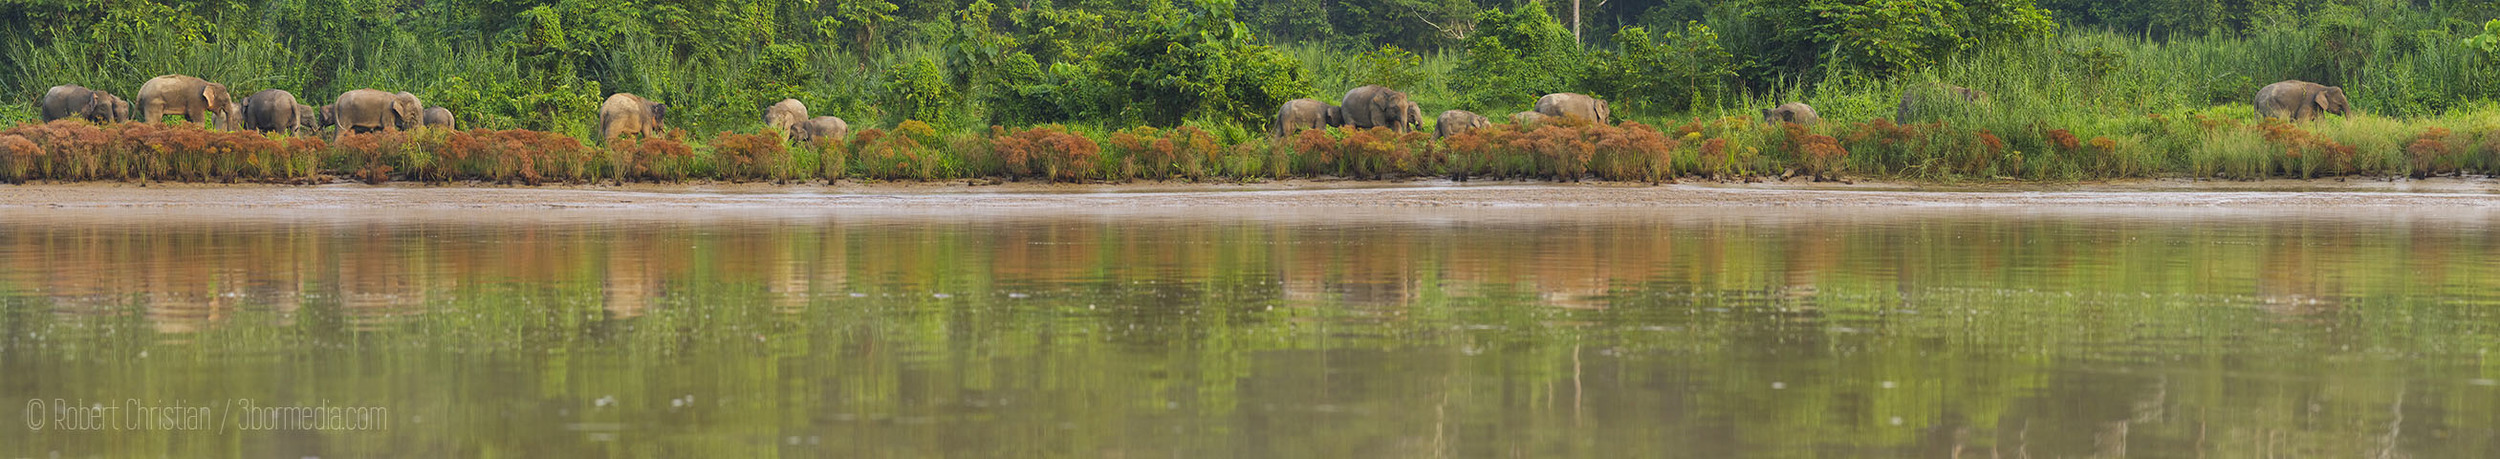 A large group of elephants on the banks of the Kinabatangan.